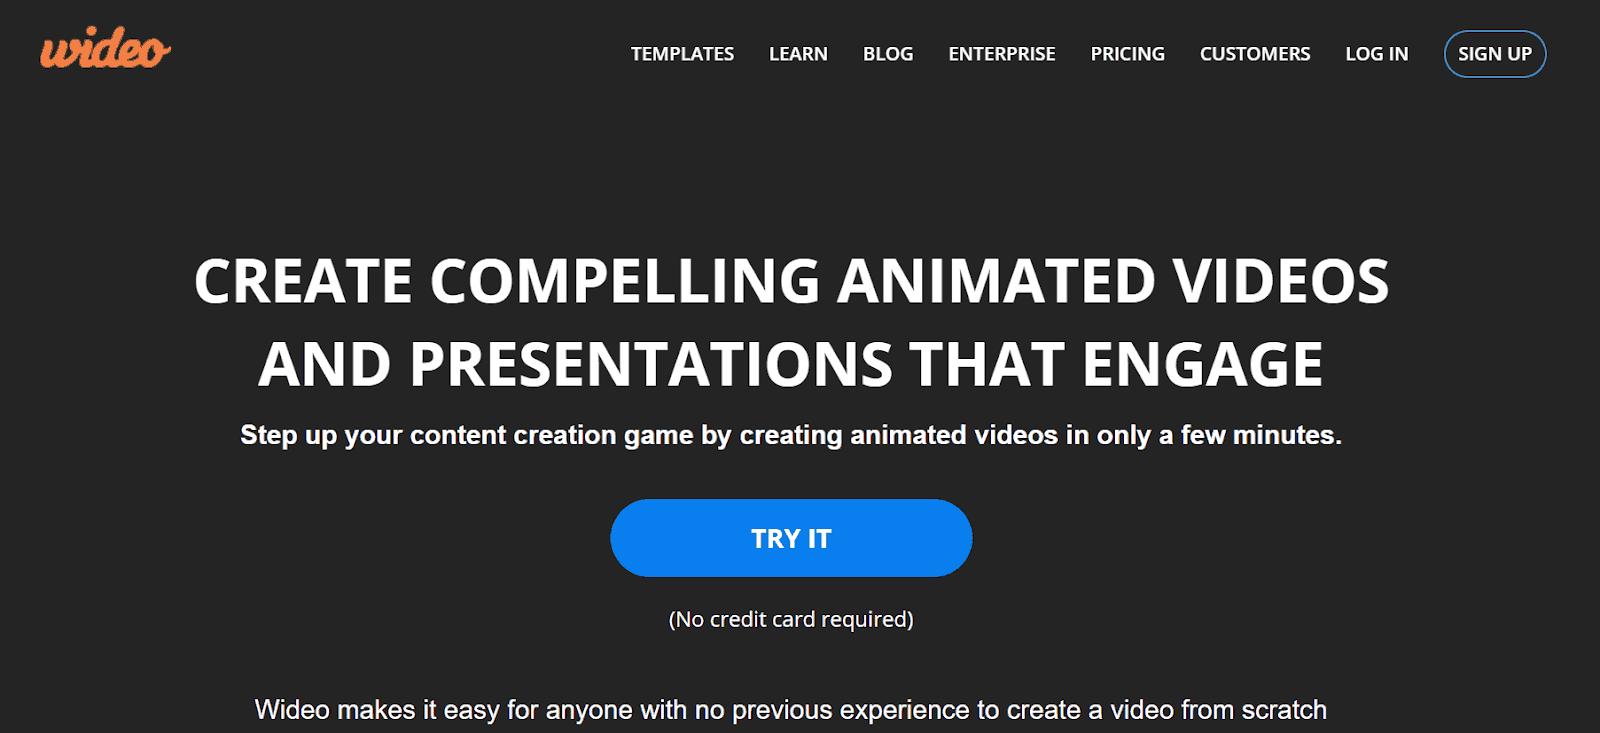 Wideo Video Marketing Tool